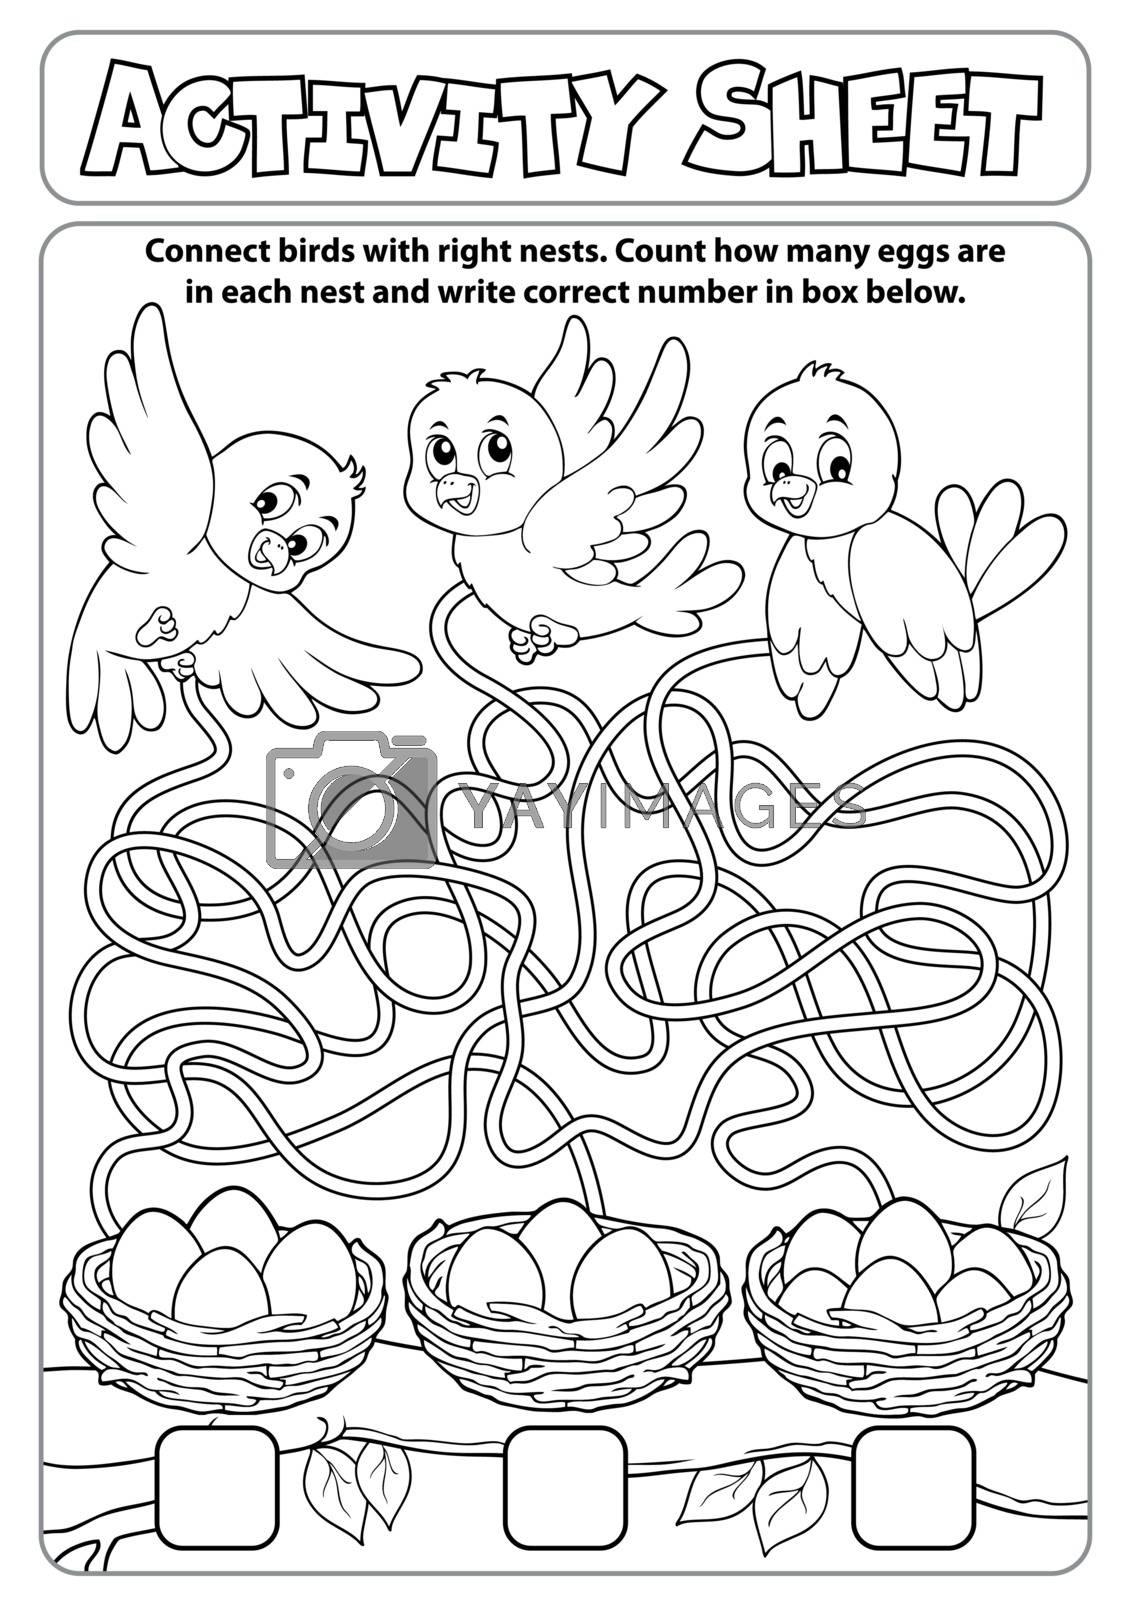 Activity sheet maze theme 1 - eps10 vector illustration.